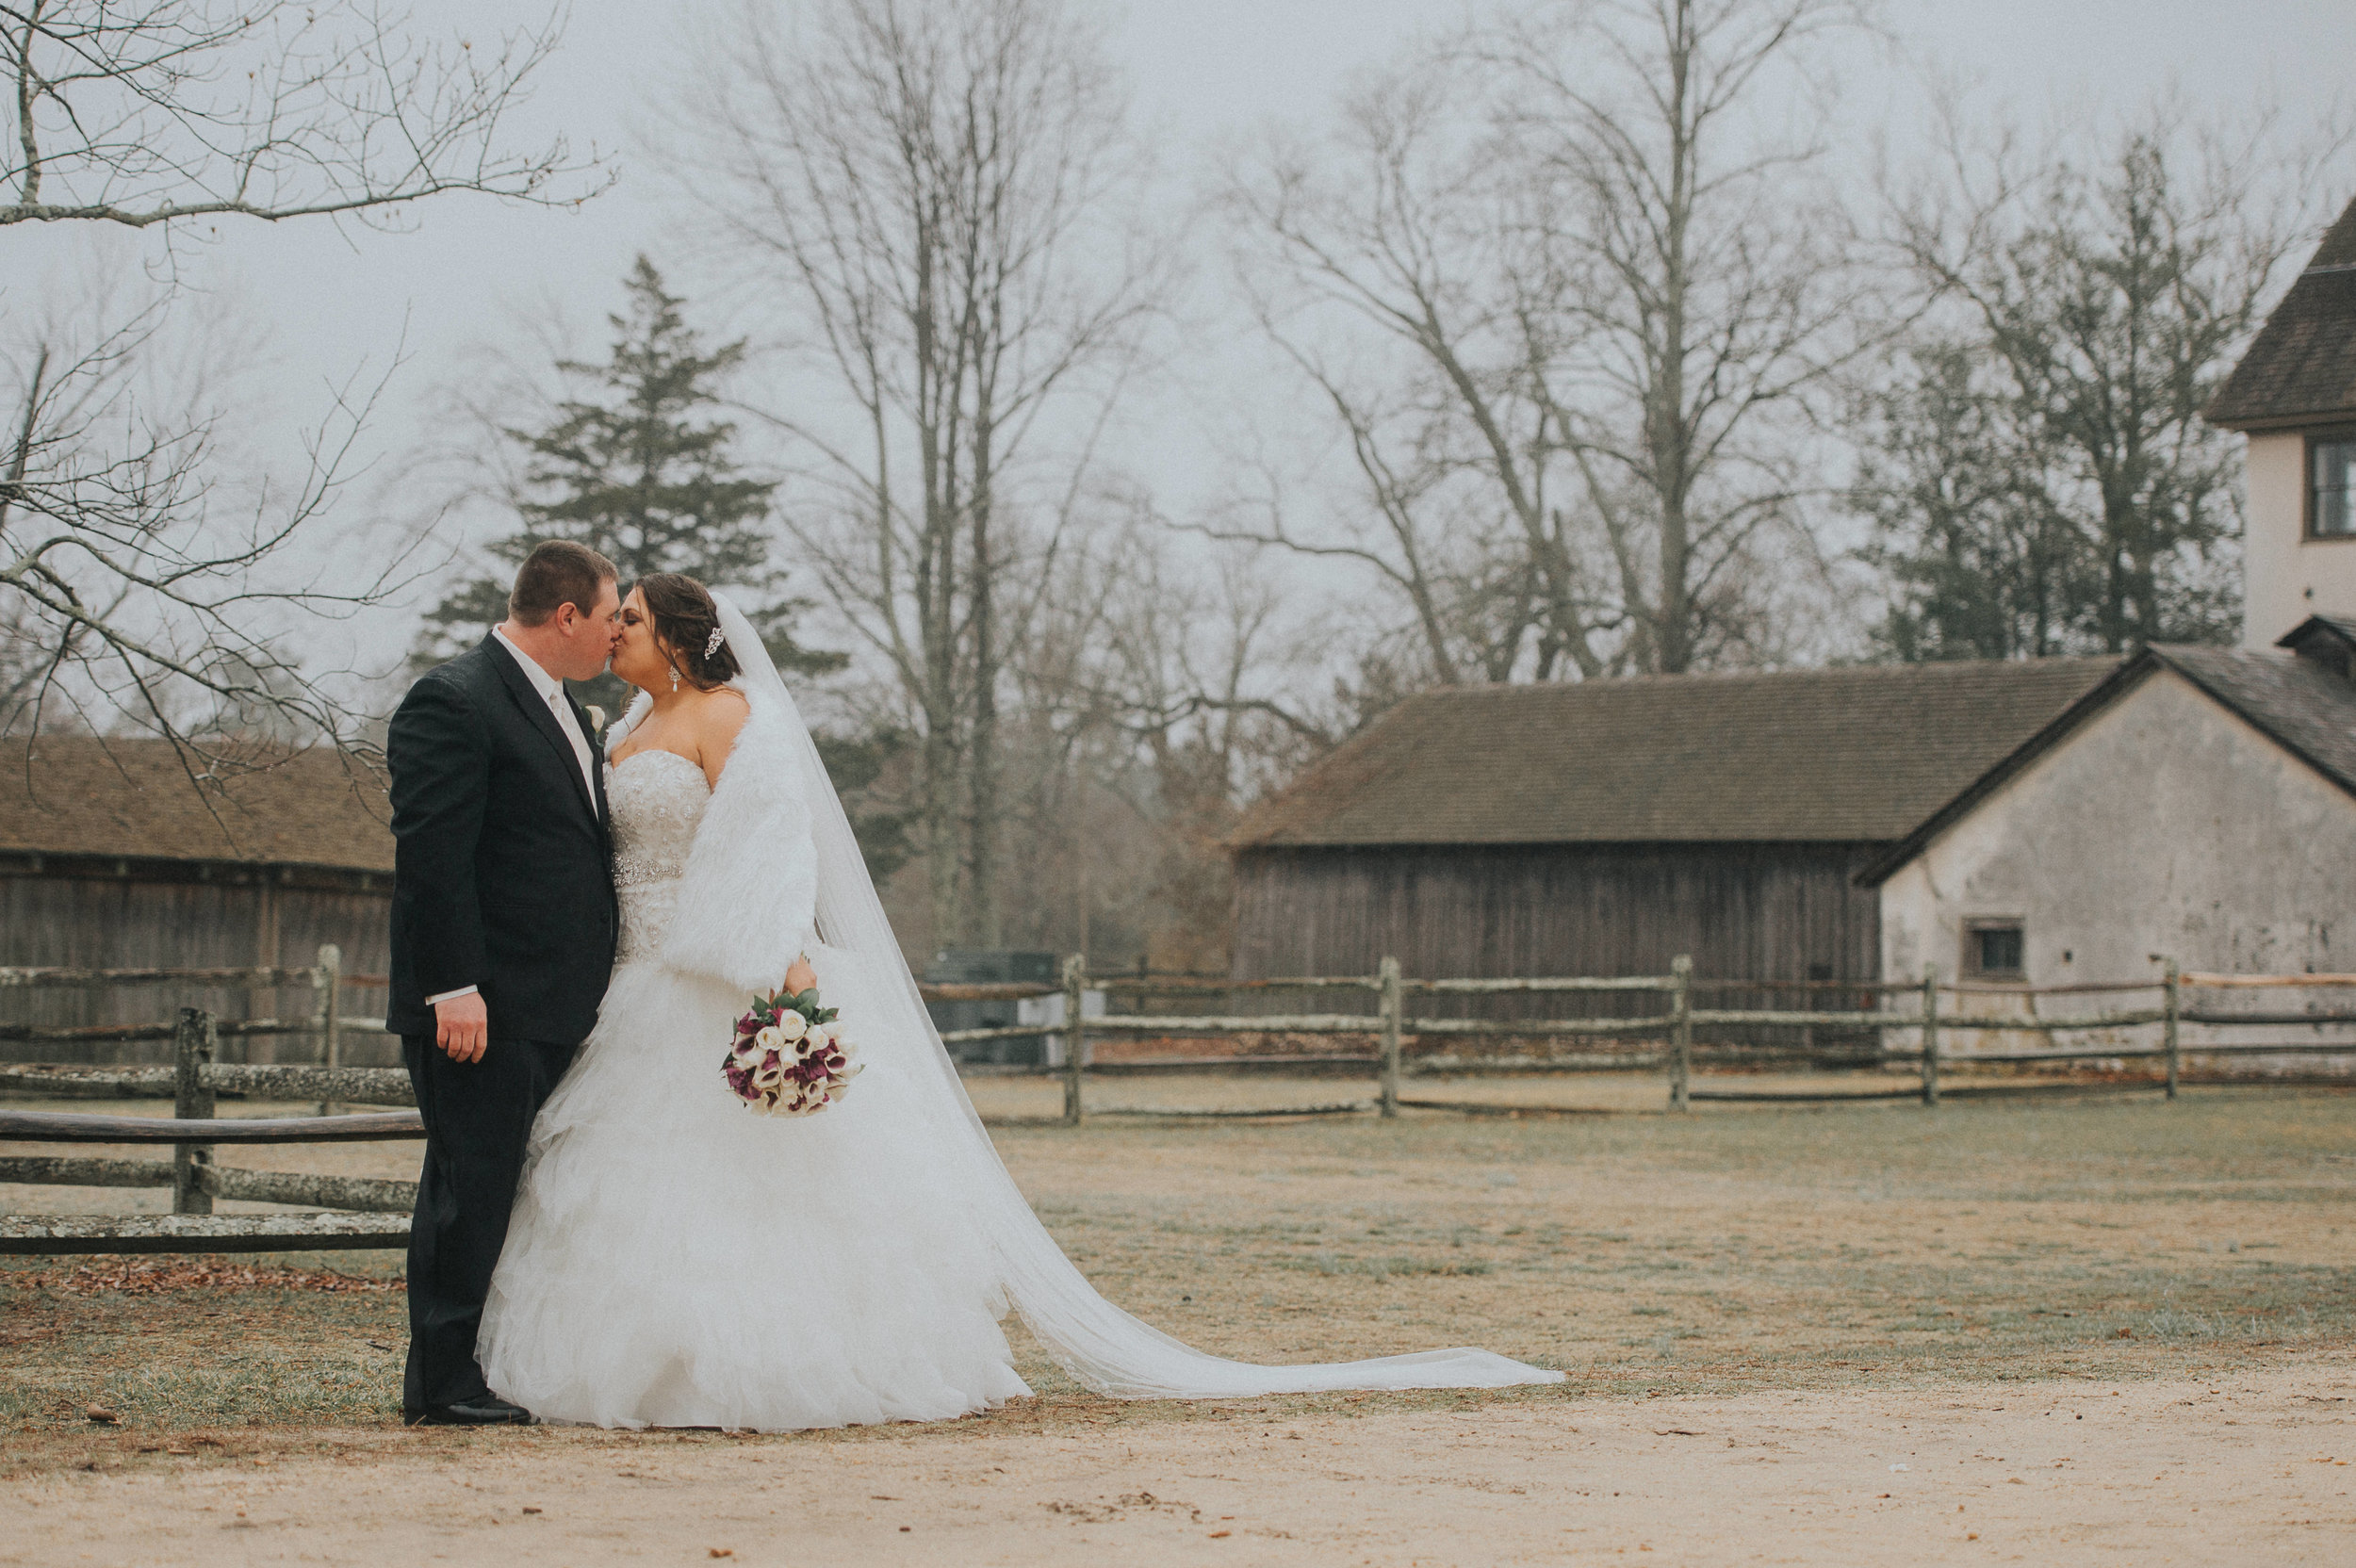 Amy-Eric-Carriage-House-Wedding-303.jpg